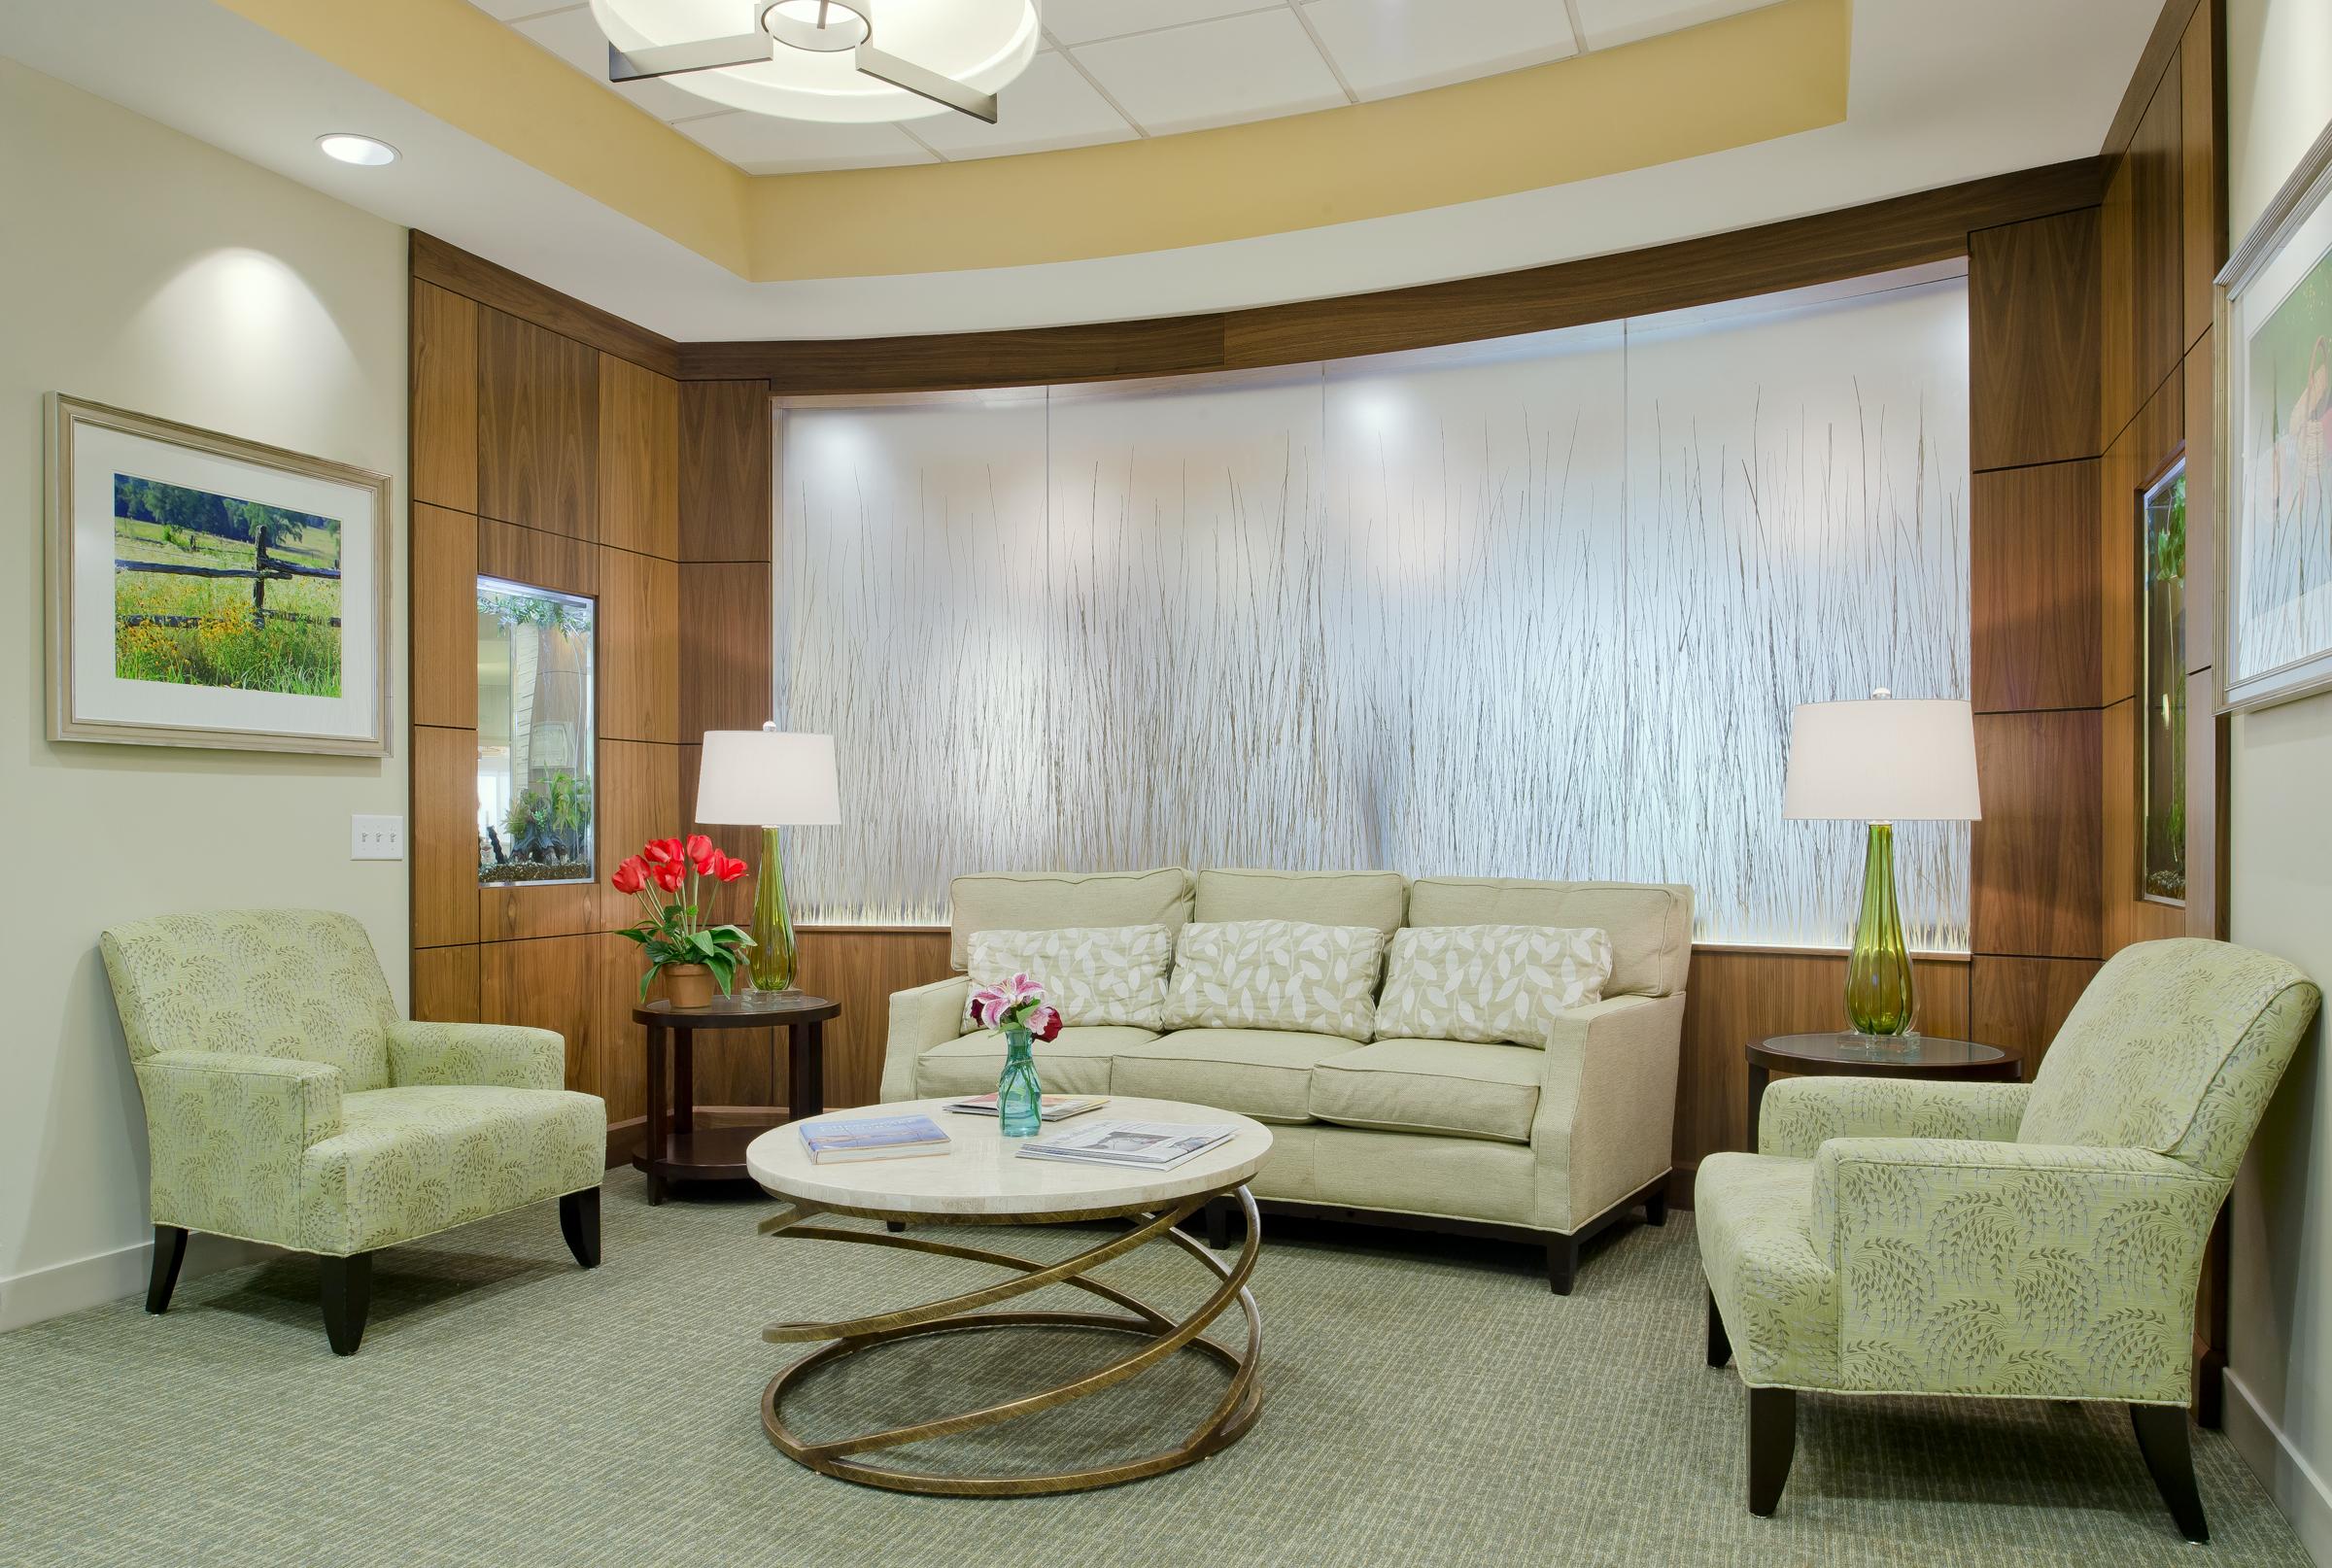 Wilson Health Care Center waiting room